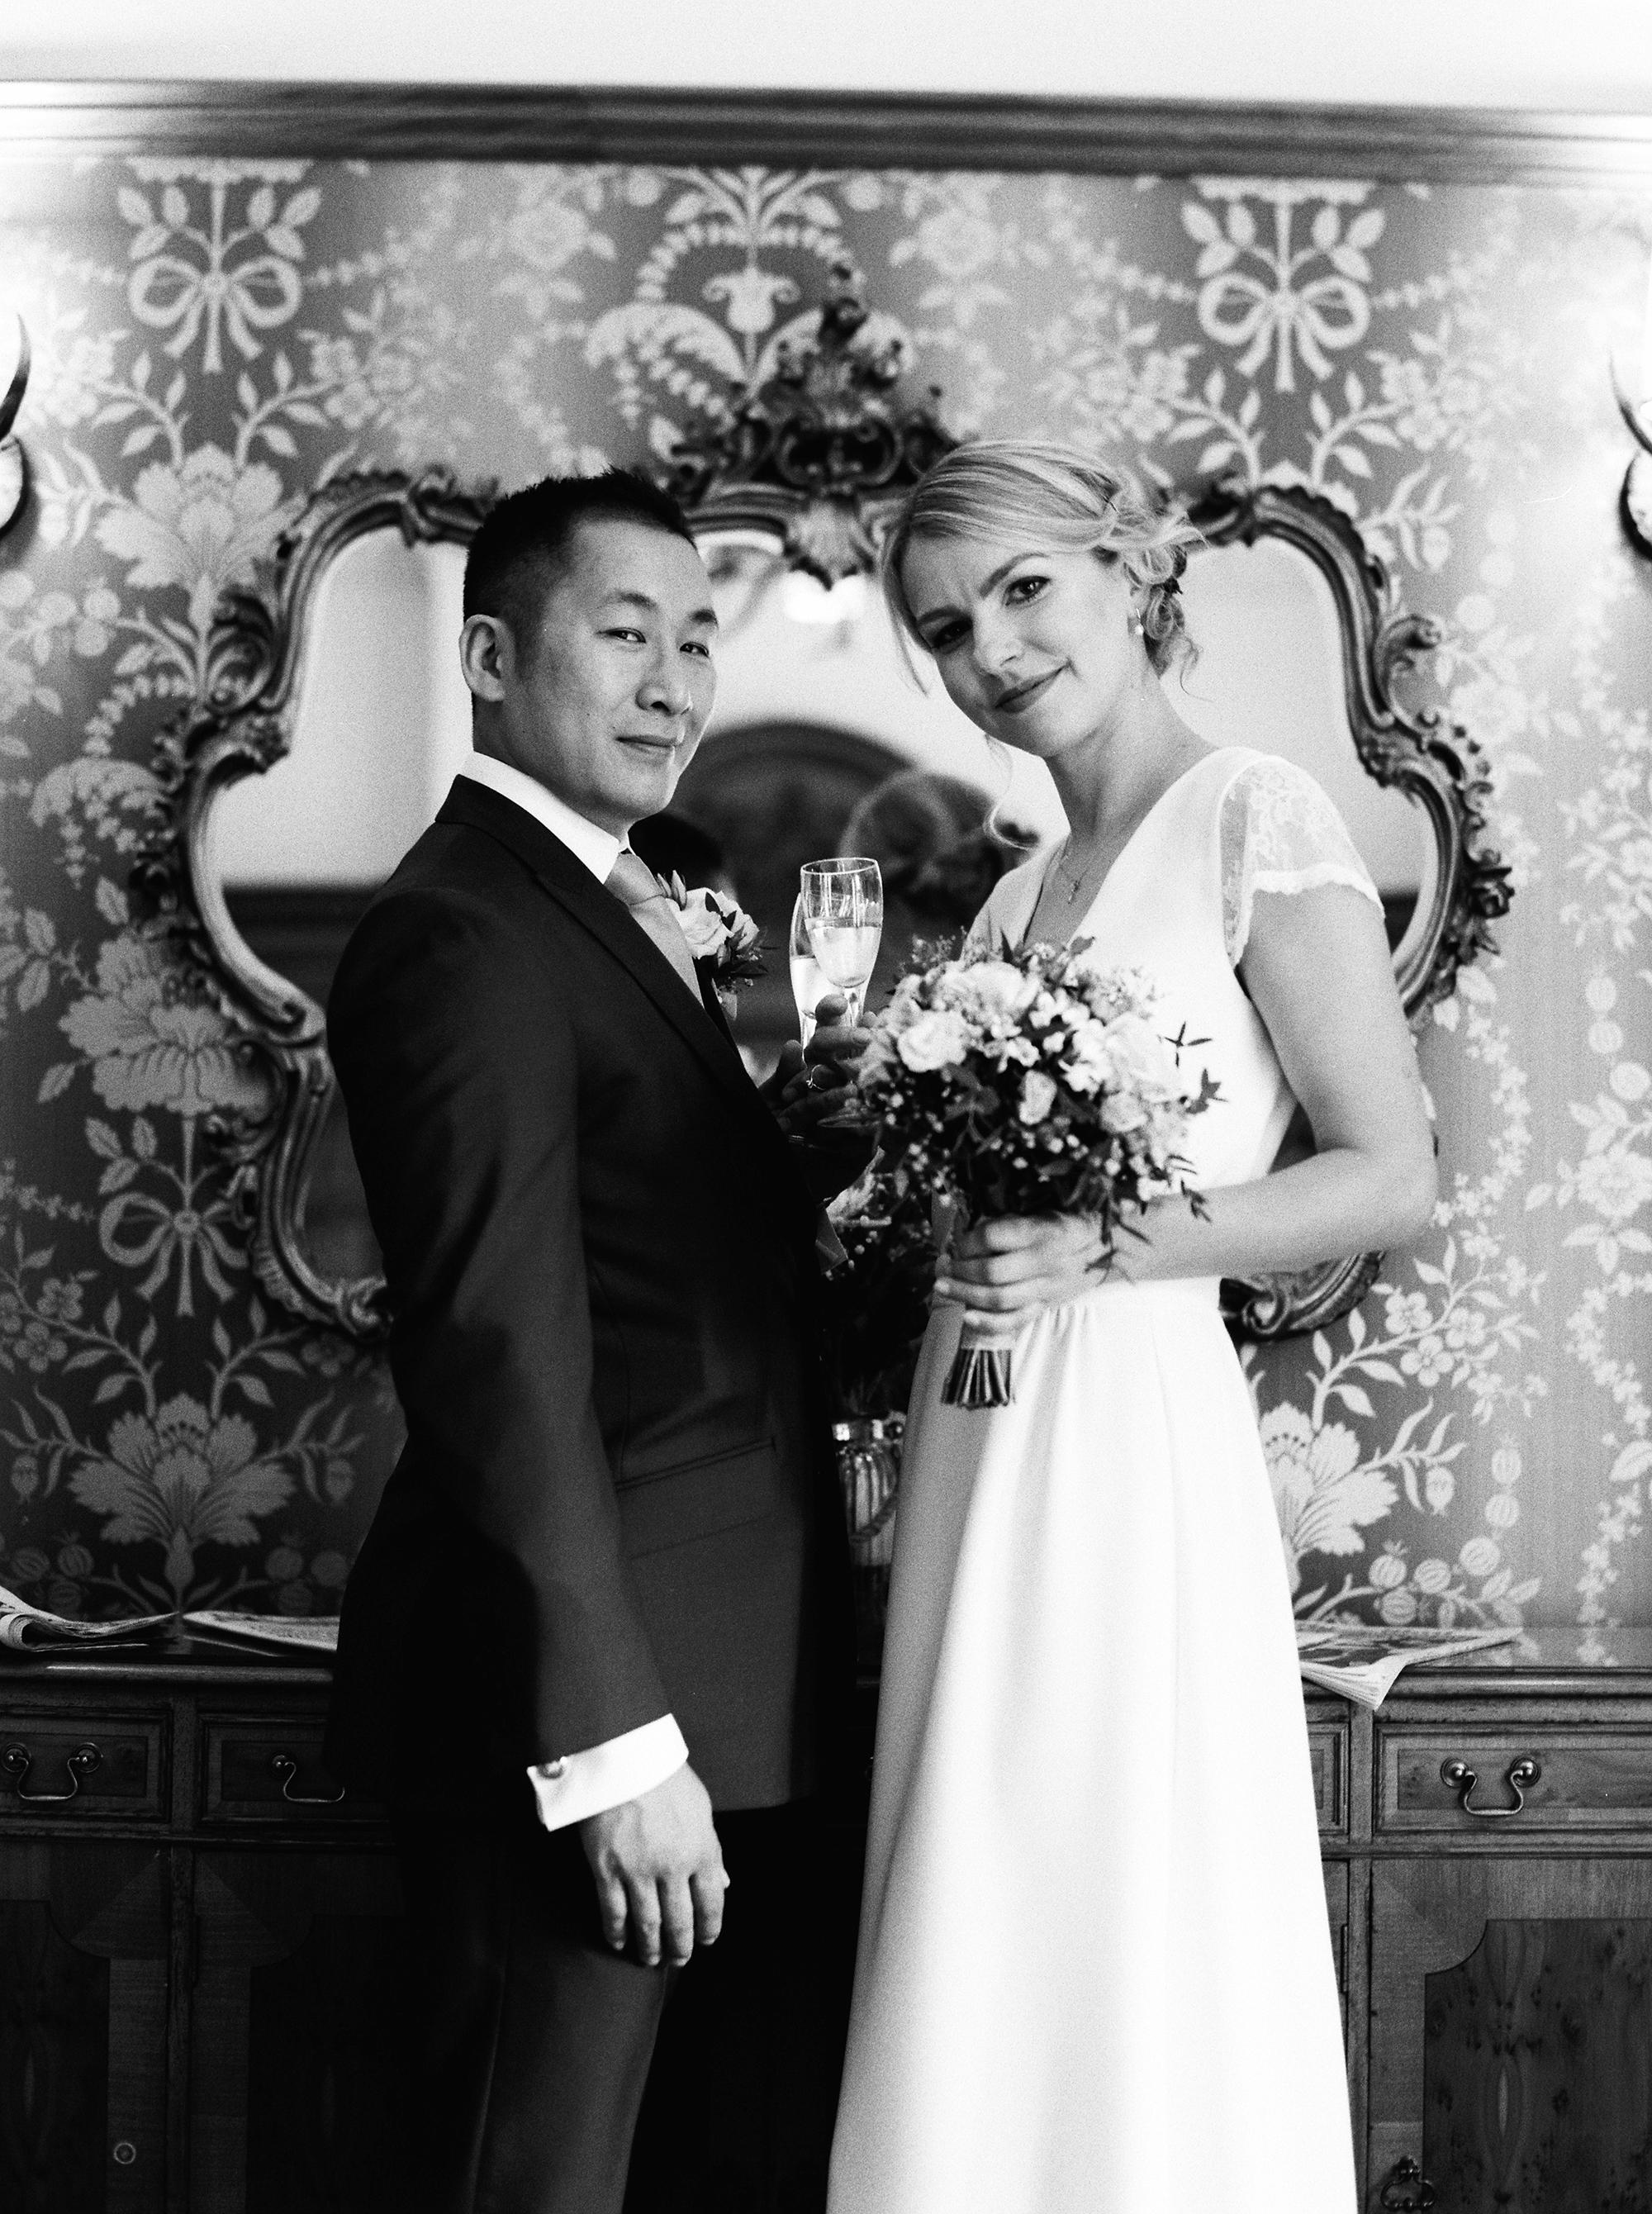 wedding_photographer_cumbria006.jpg